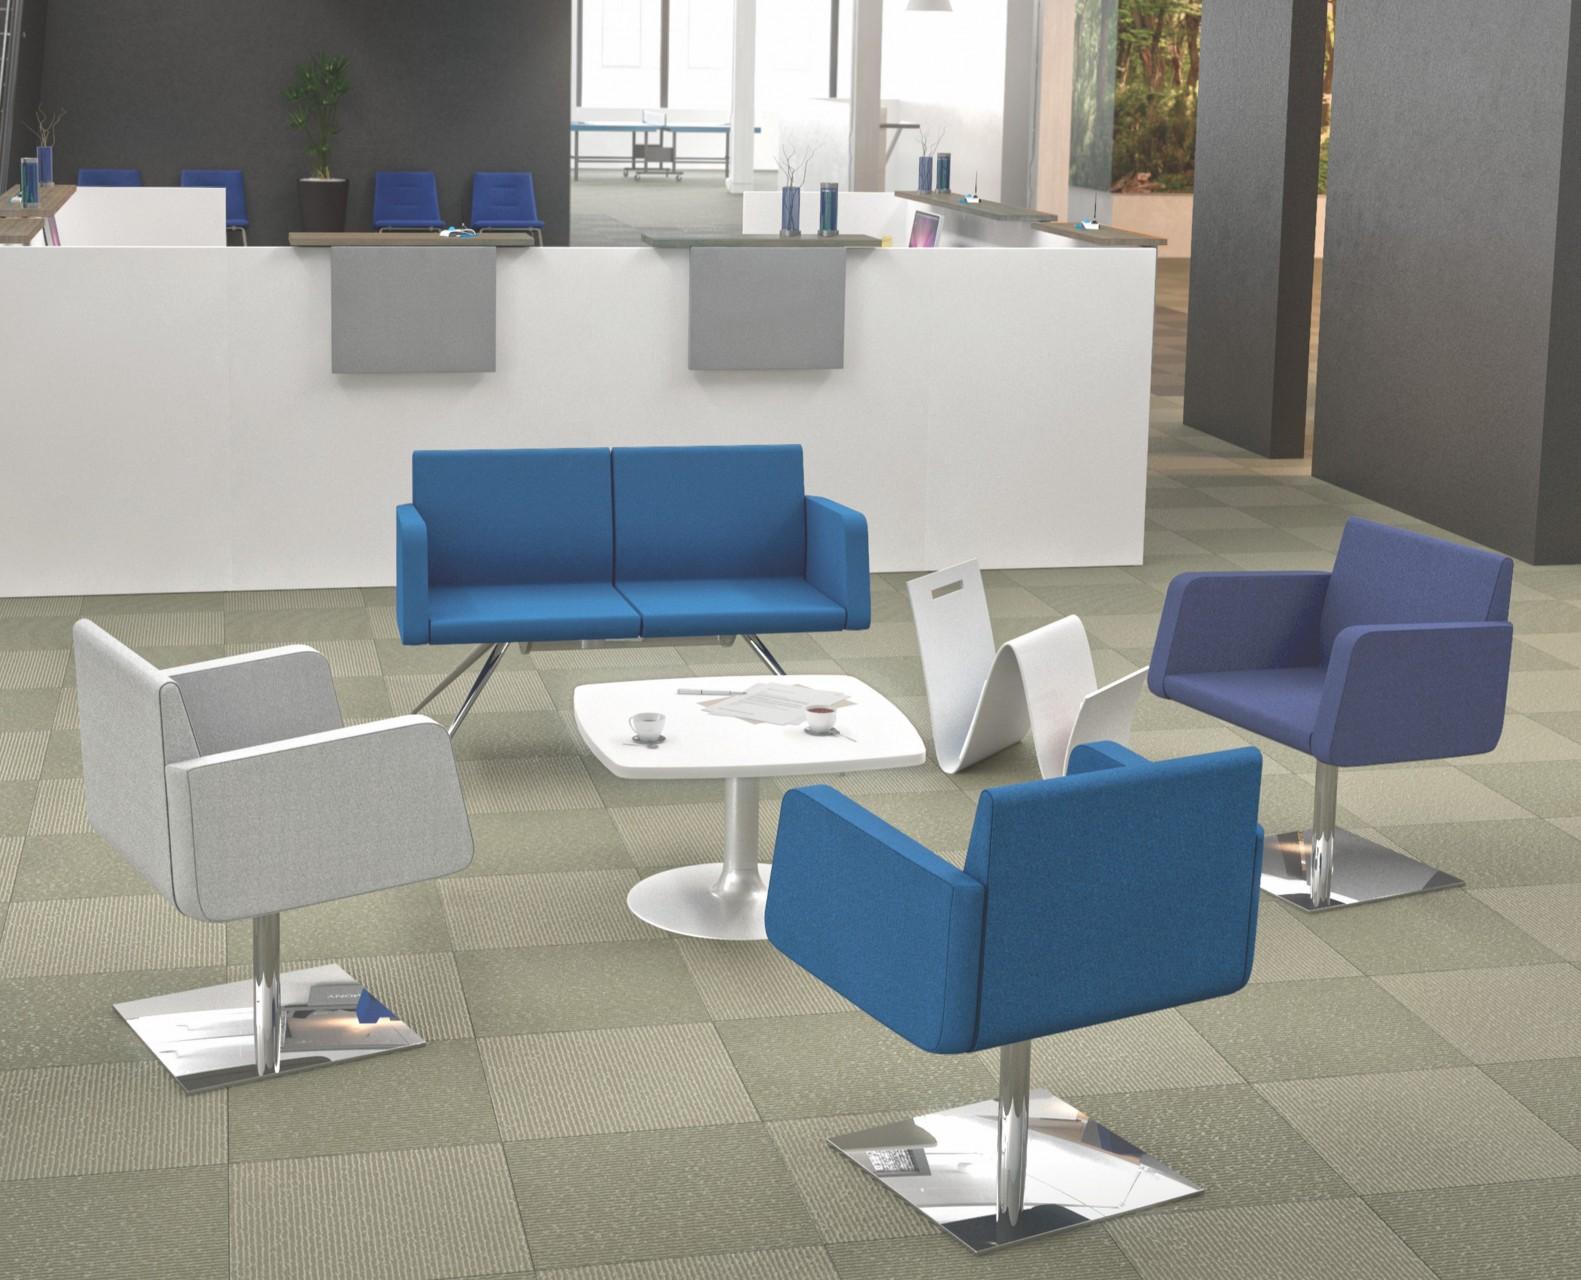 chauffeuse 1 place easy achat fauteuils d 39 accueil canap s chaises salle d 39 attente 365 00. Black Bedroom Furniture Sets. Home Design Ideas